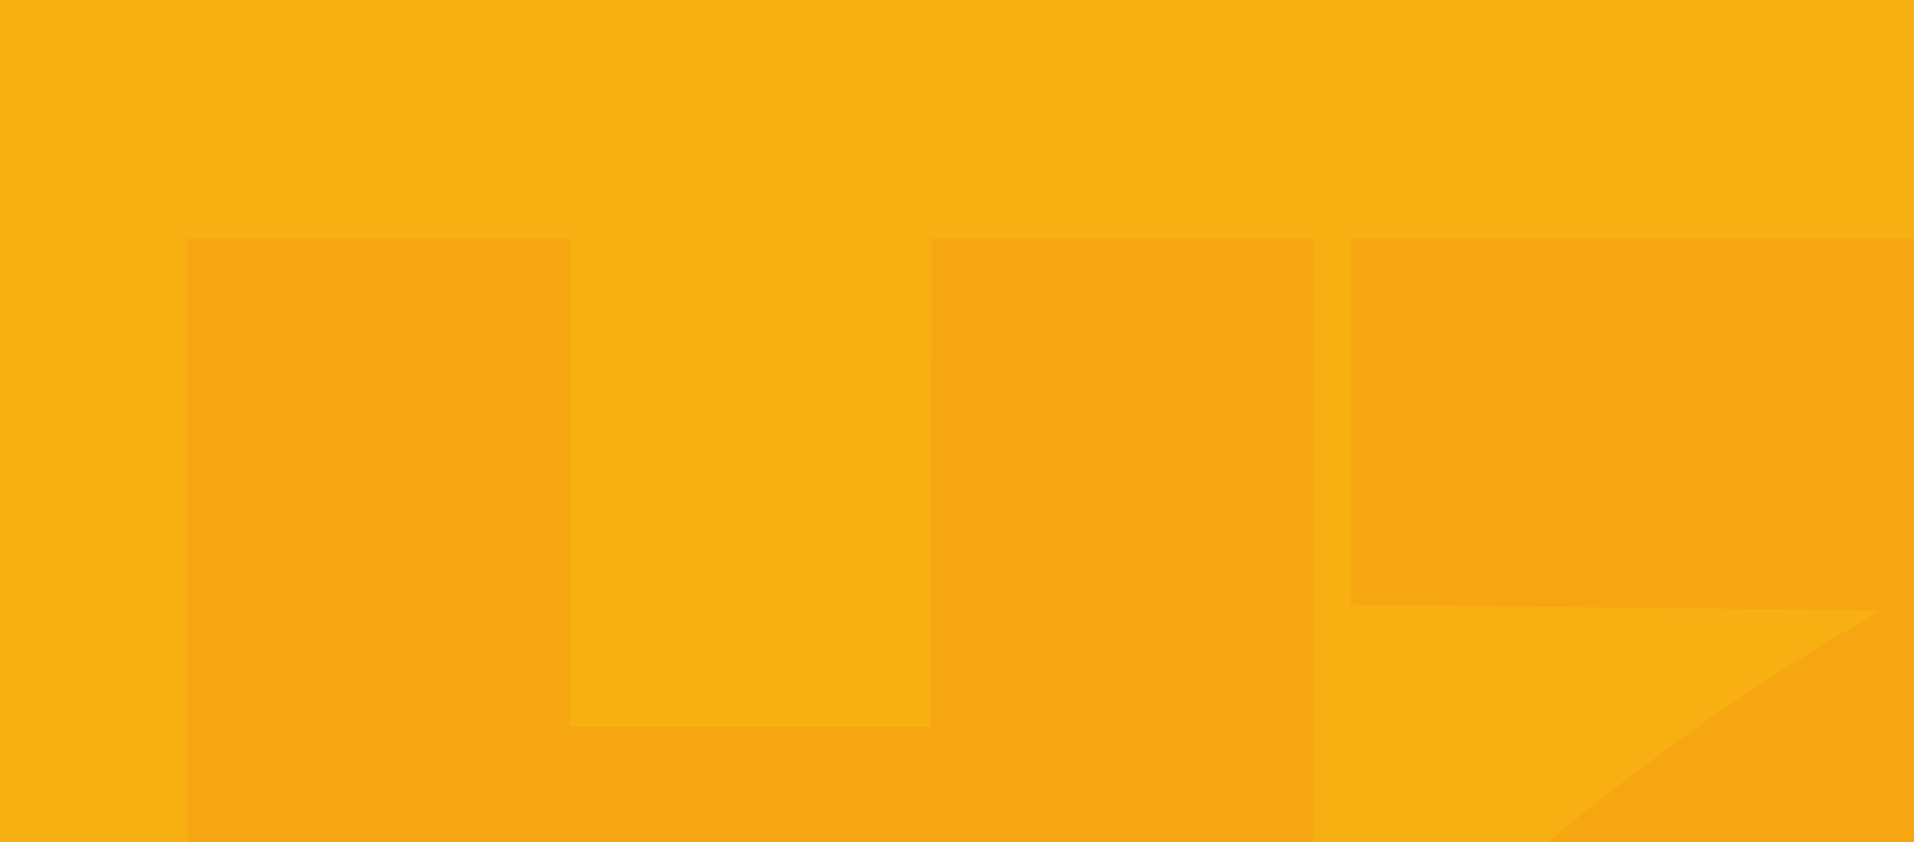 banner h7 amarelo